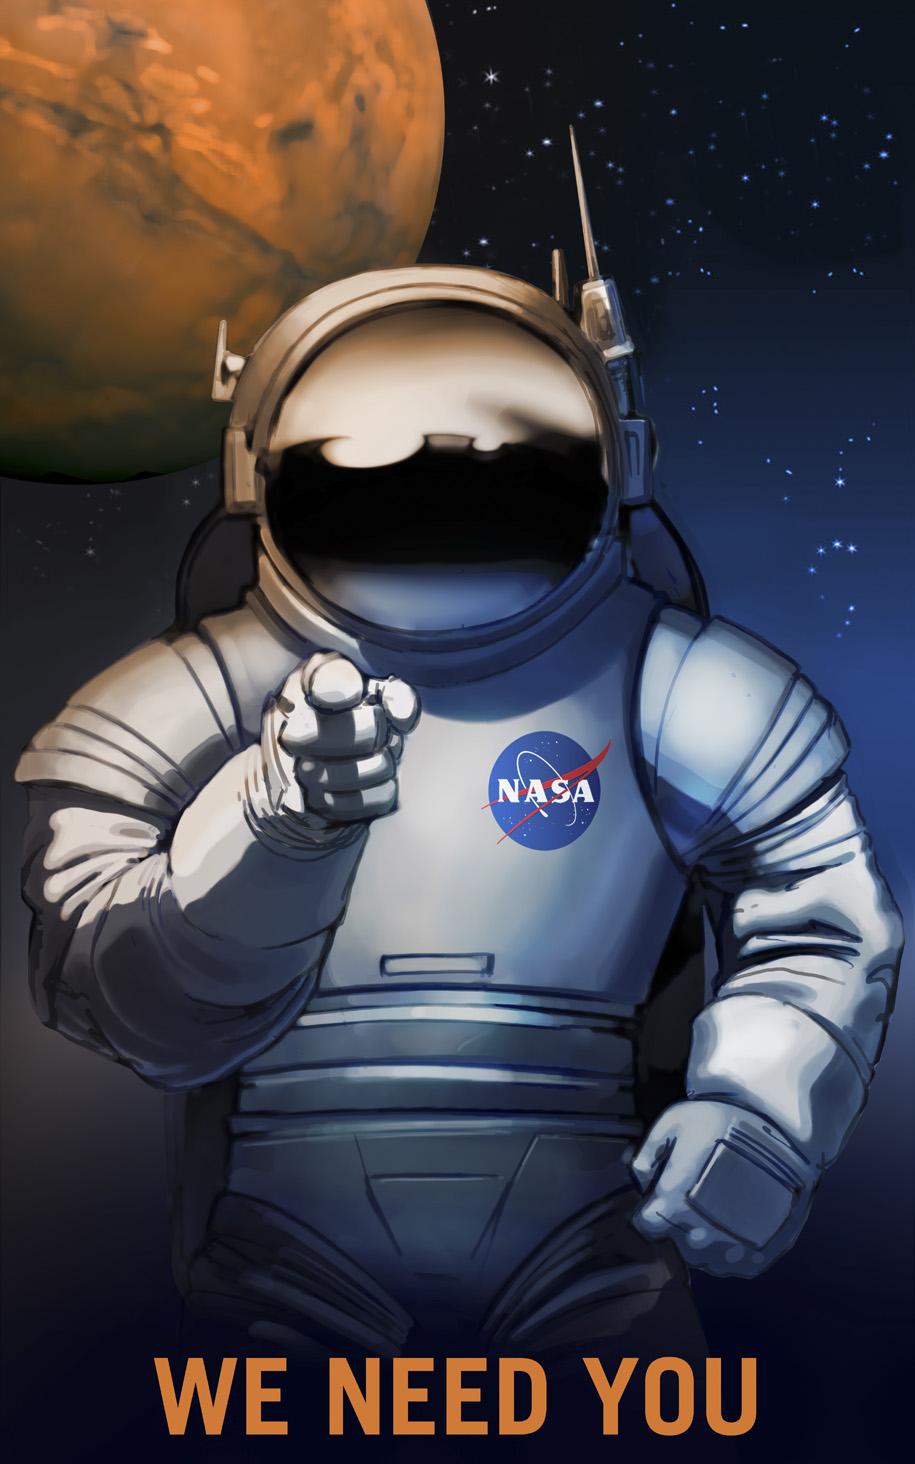 mars-recruitment-posters-nasa-8